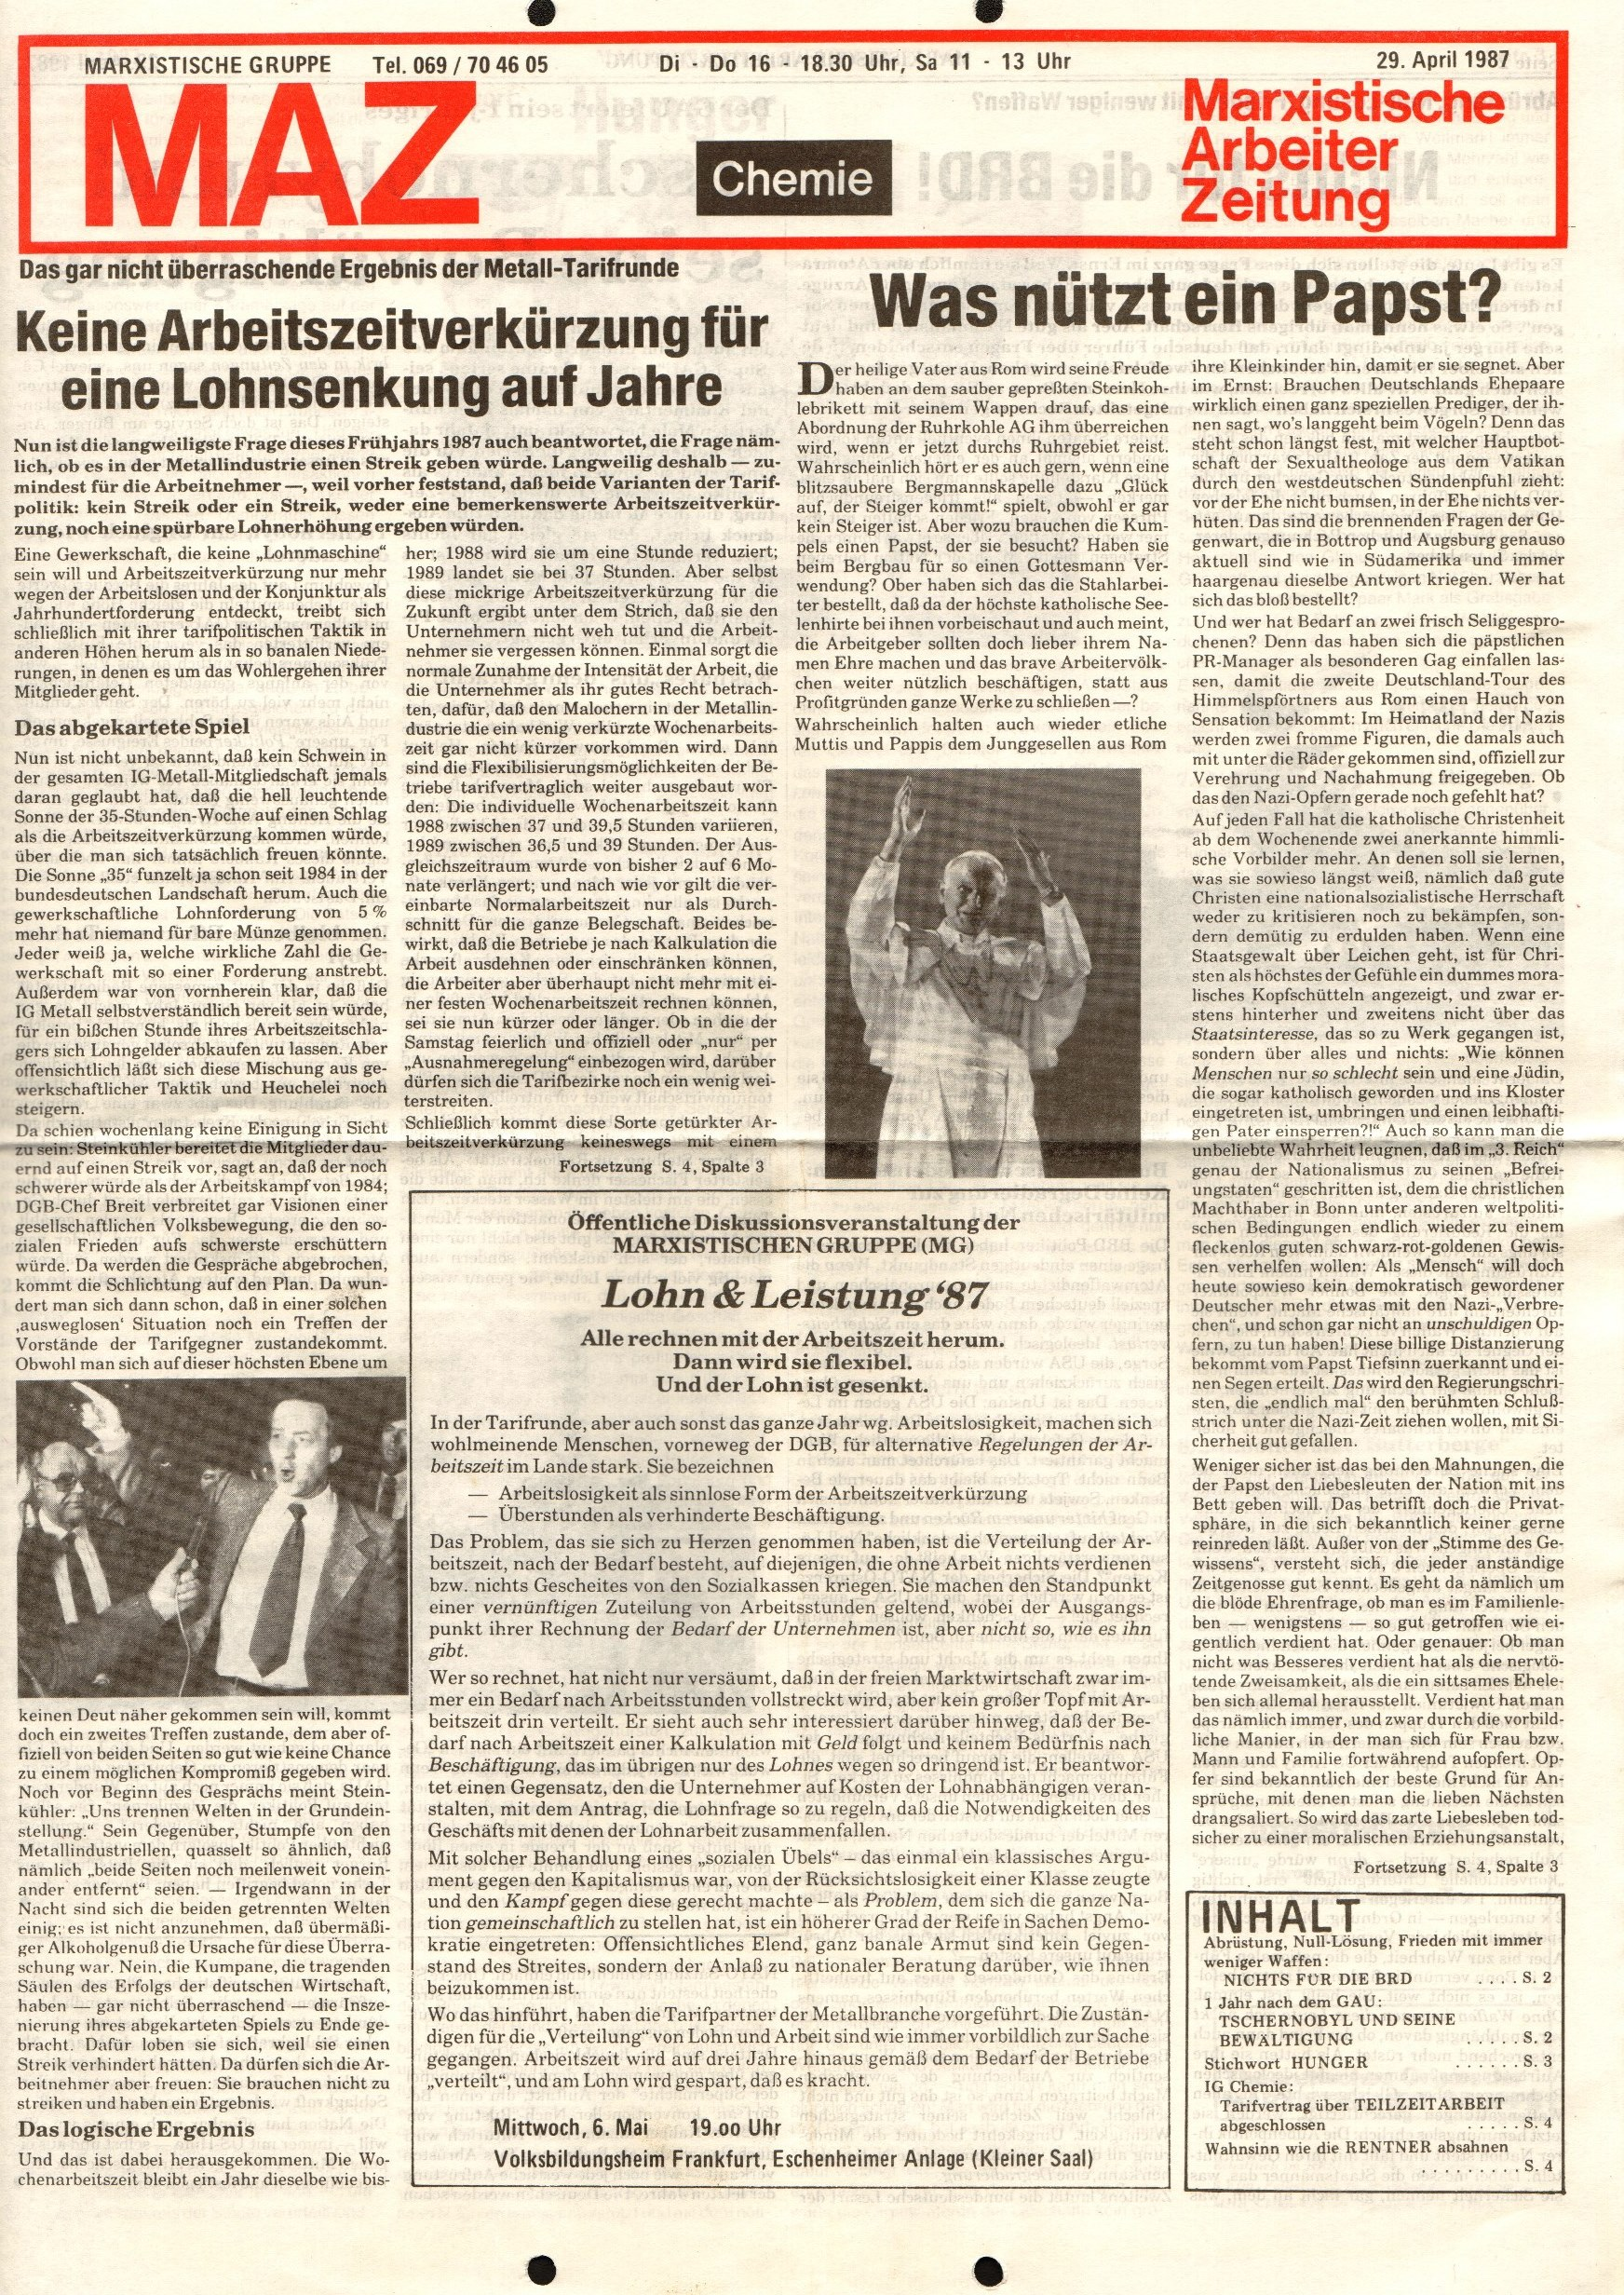 Frankfurt_CPK_Hoechst_MAZ437